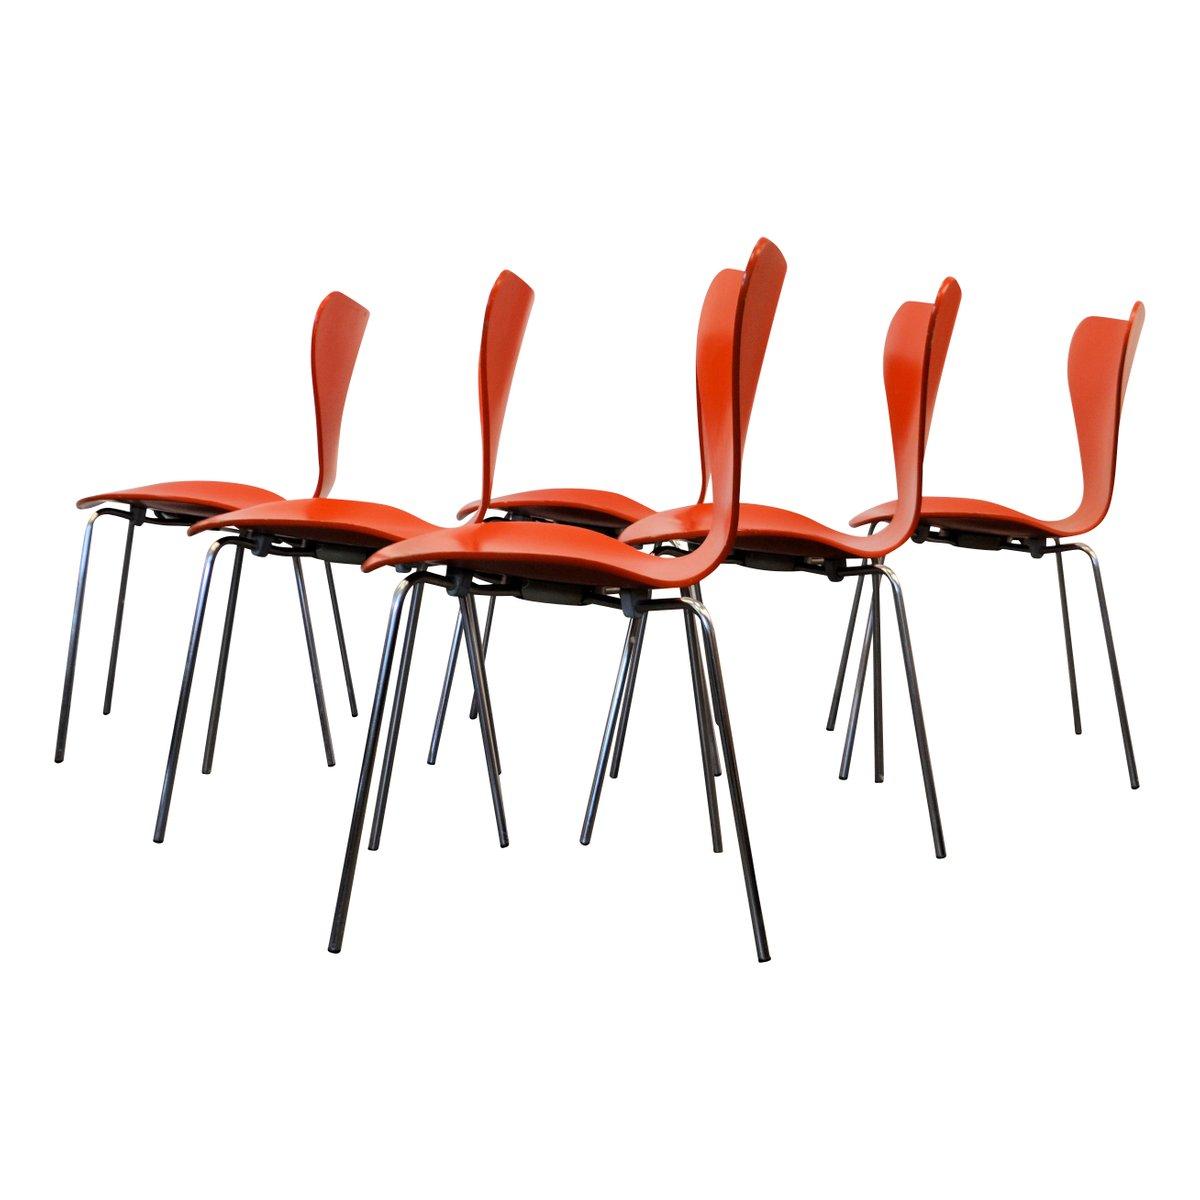 arne jacobsen furniture. price per set arne jacobsen furniture